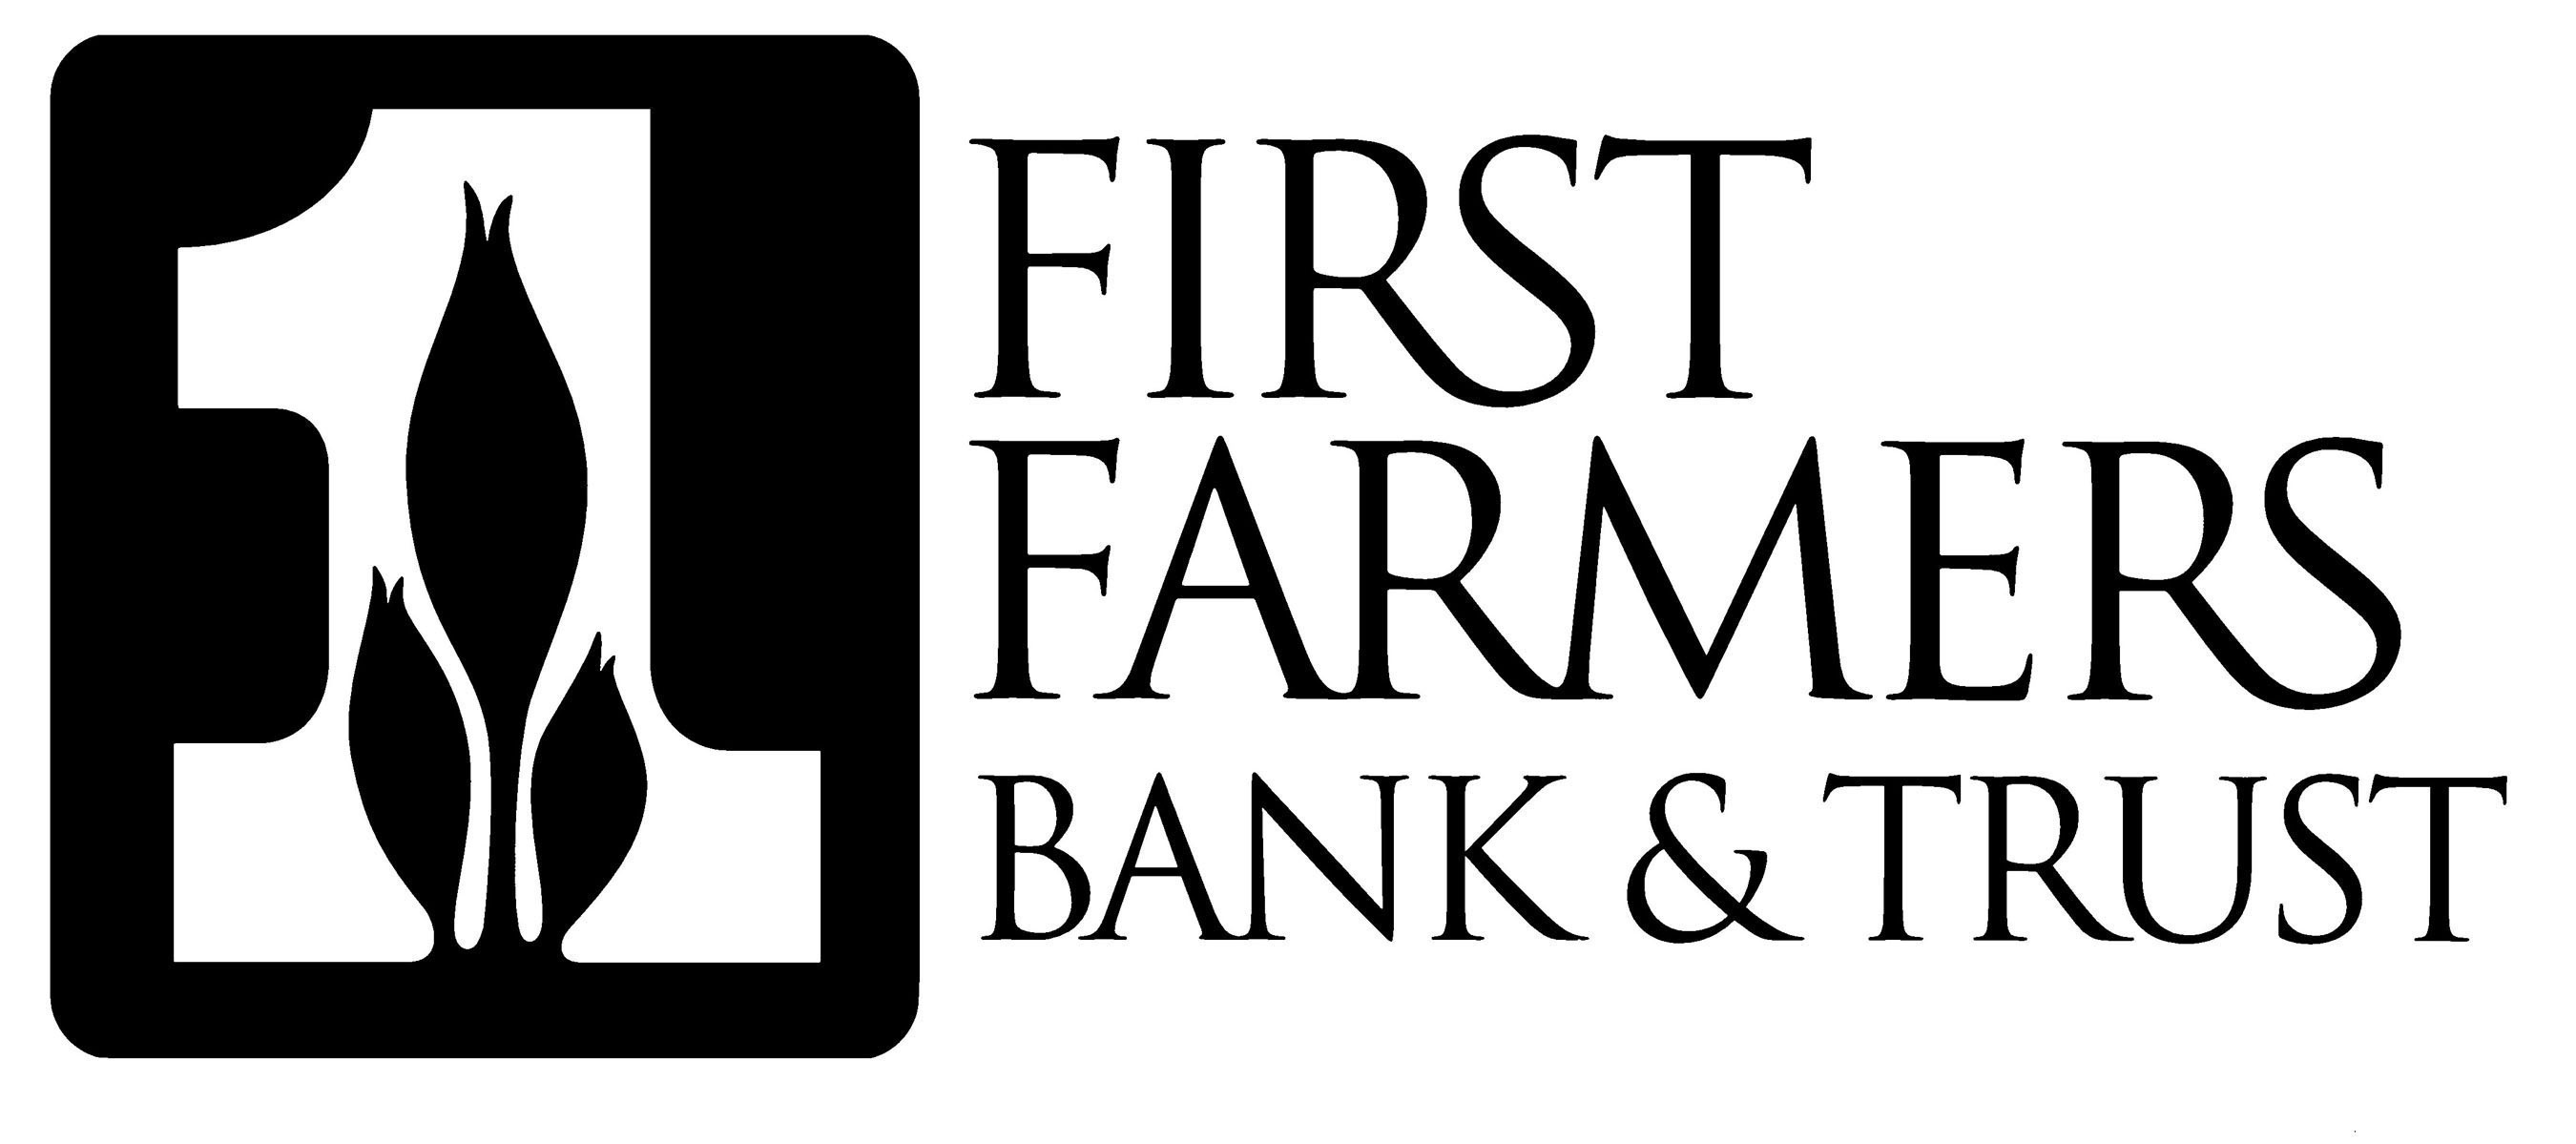 First Farmers Bank & Trust Logo.